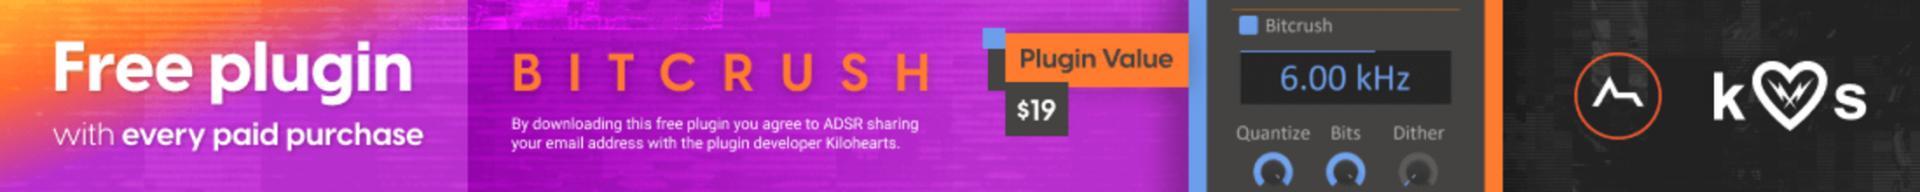 Free-Plugin-July-Kilohearts-Bitcrush.png.jpg